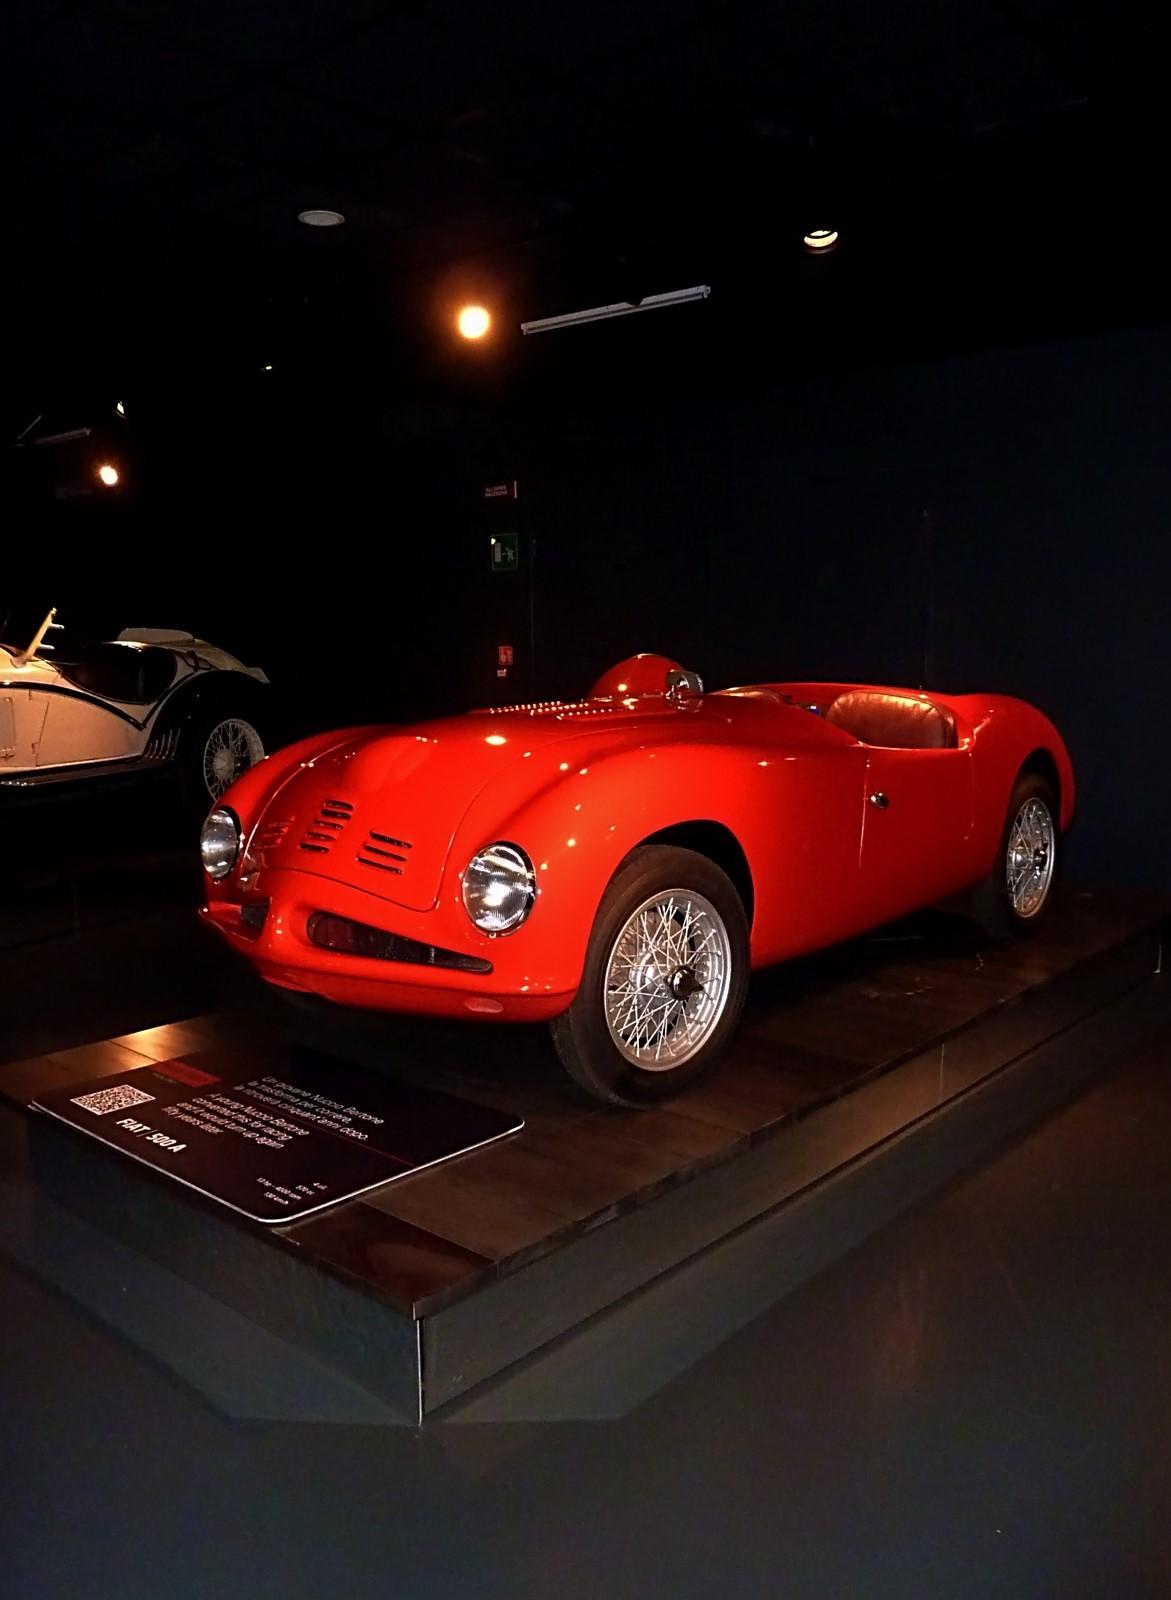 1936-47 FIAT 500A Barchetta by Bertone (2).jpg